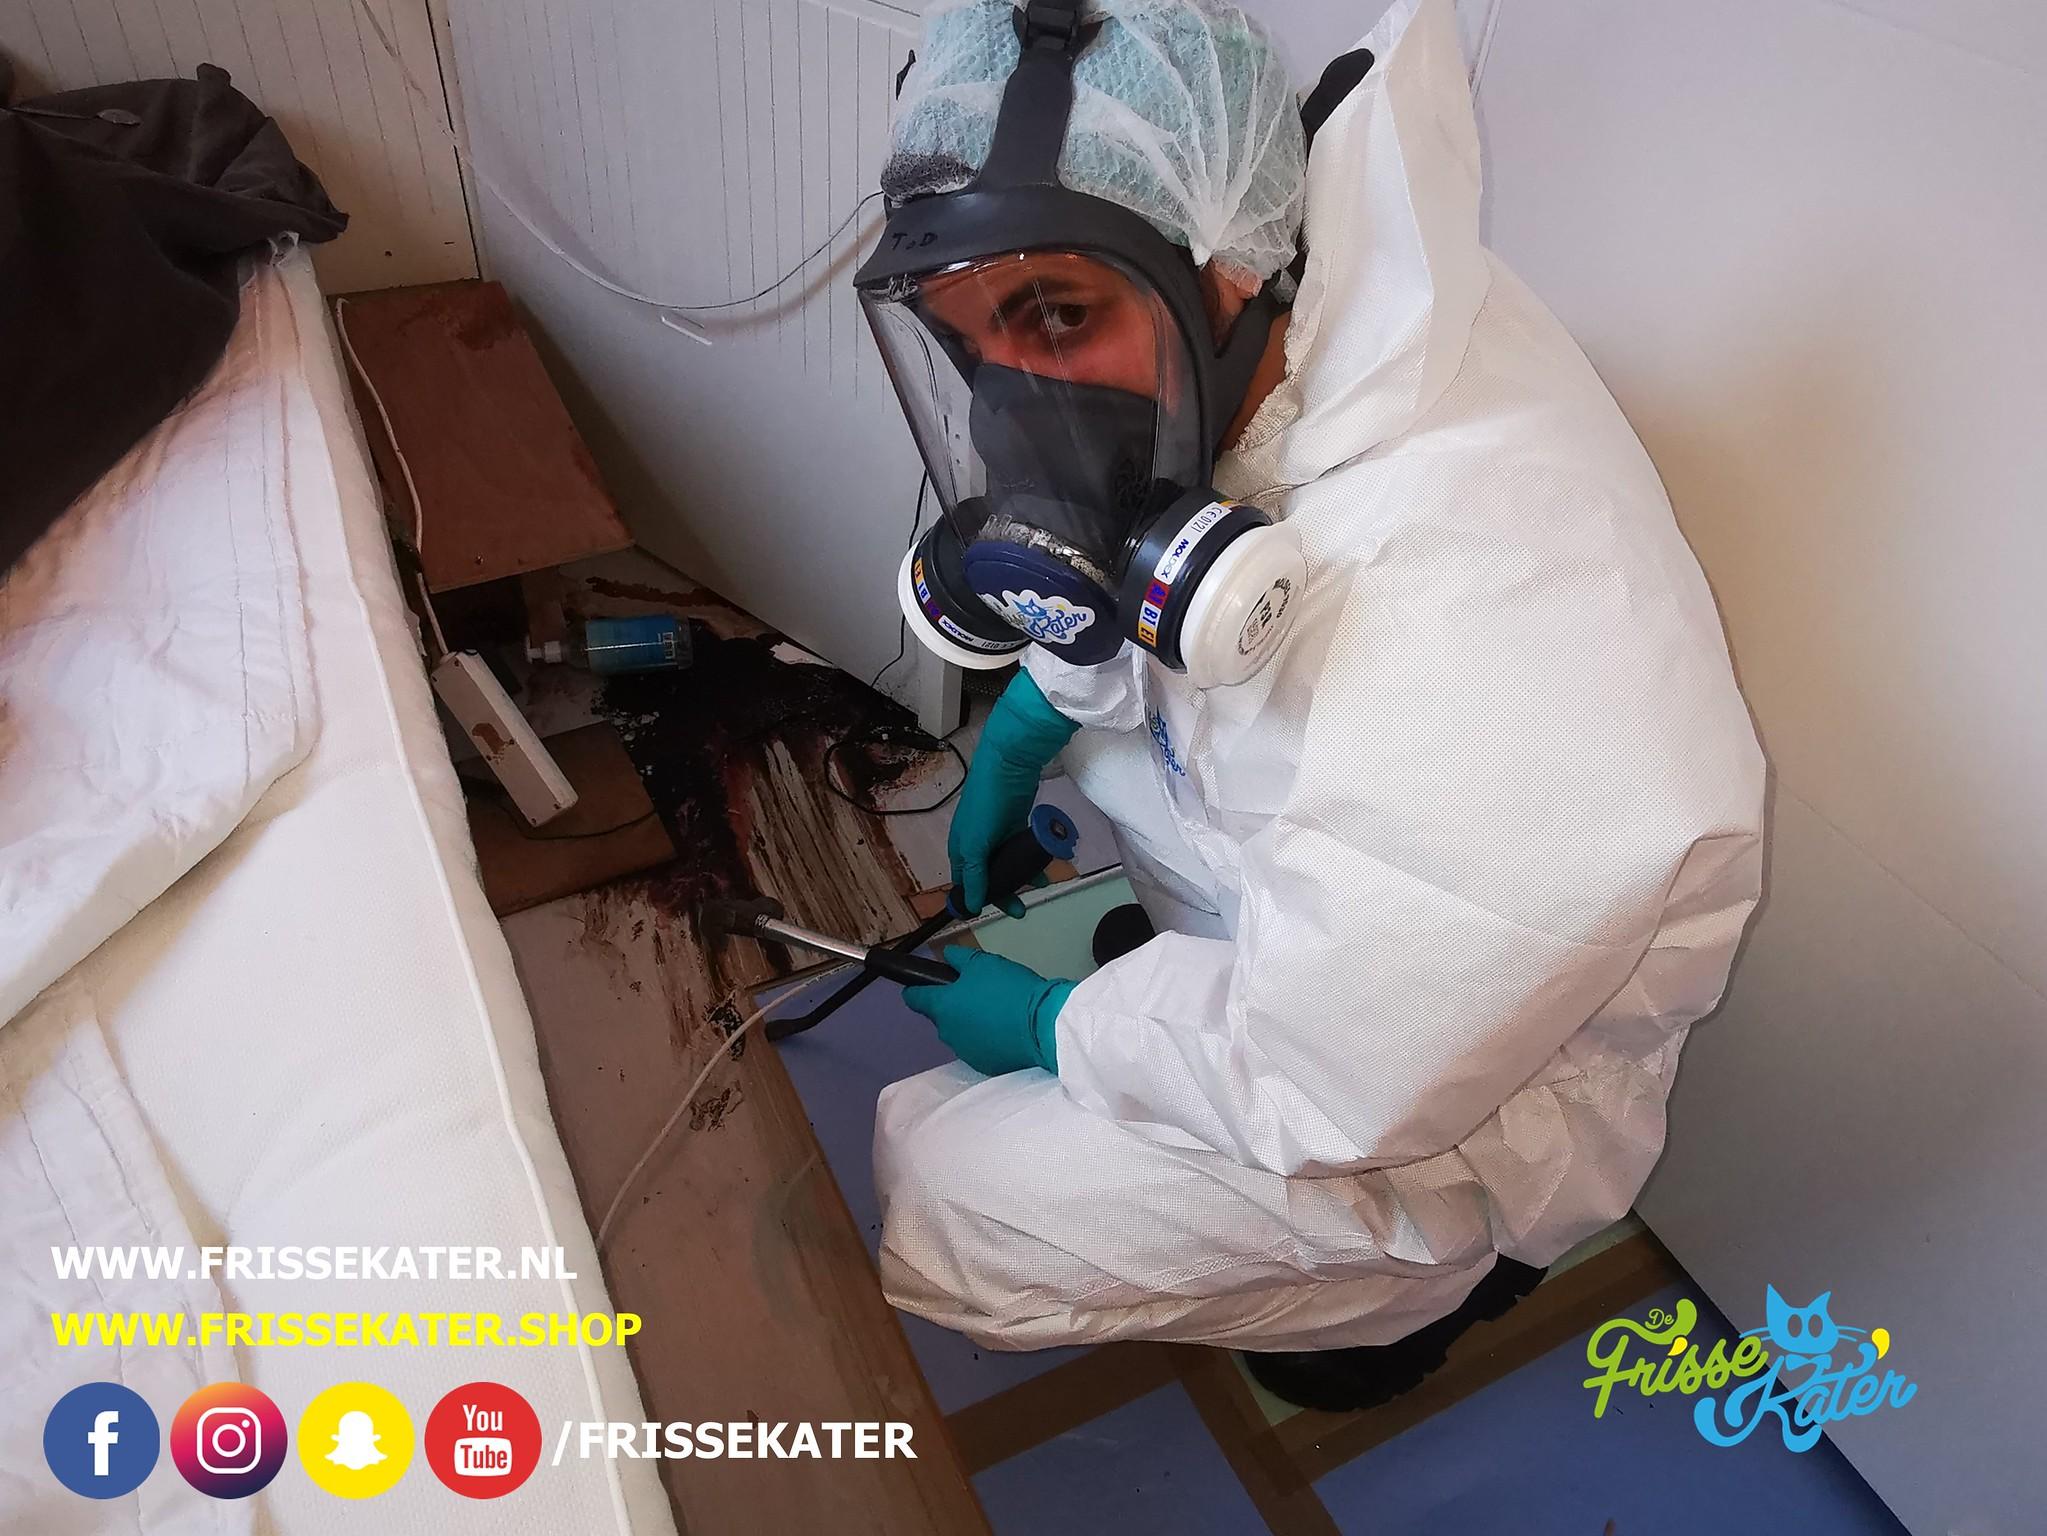 crime scene cleaner tugrul cirakoglu